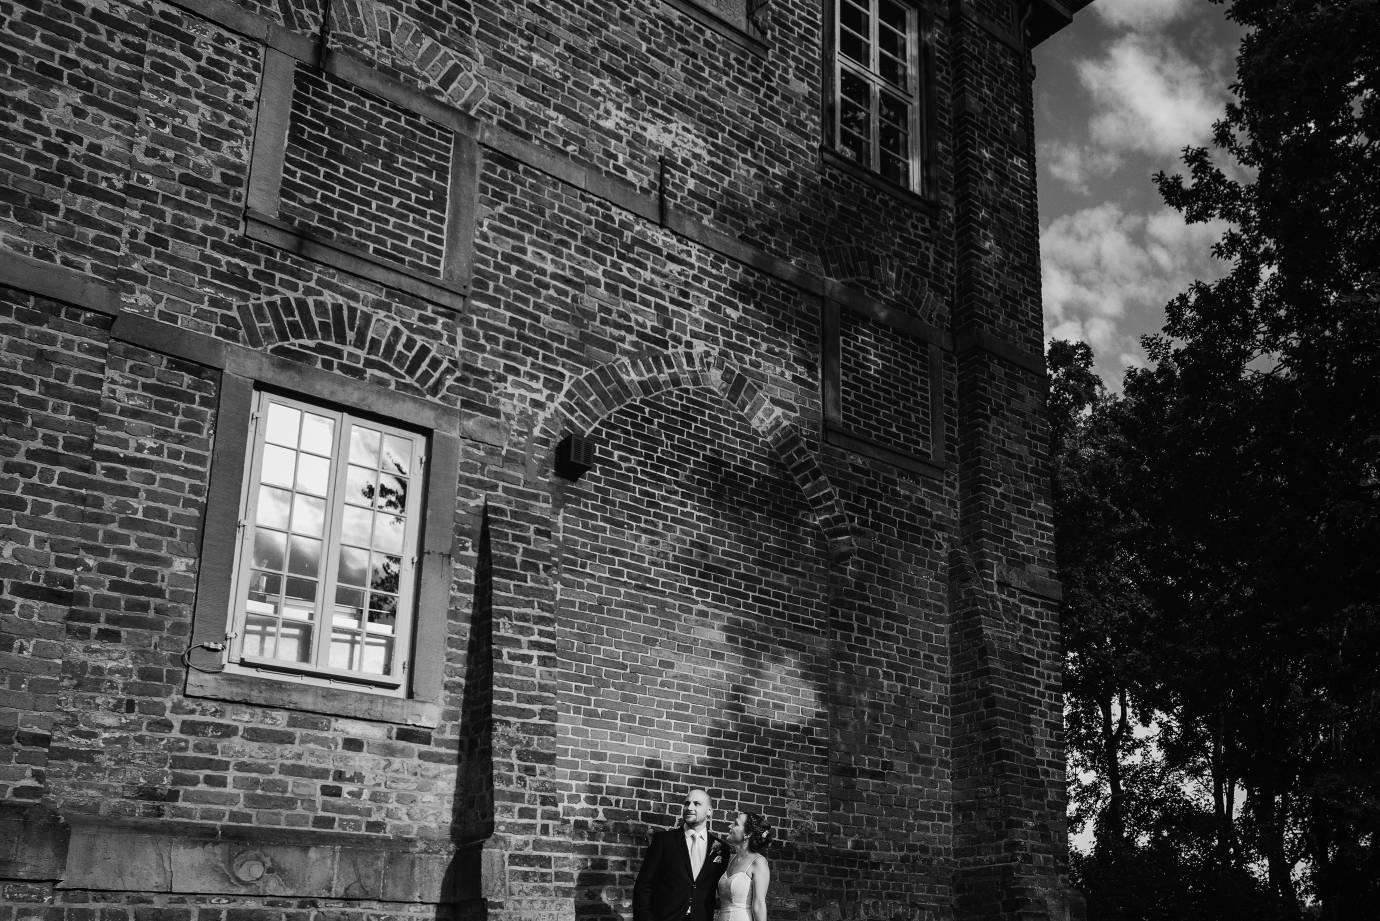 hochzeitsfotograf vegesack 020 - Nadine+Börge